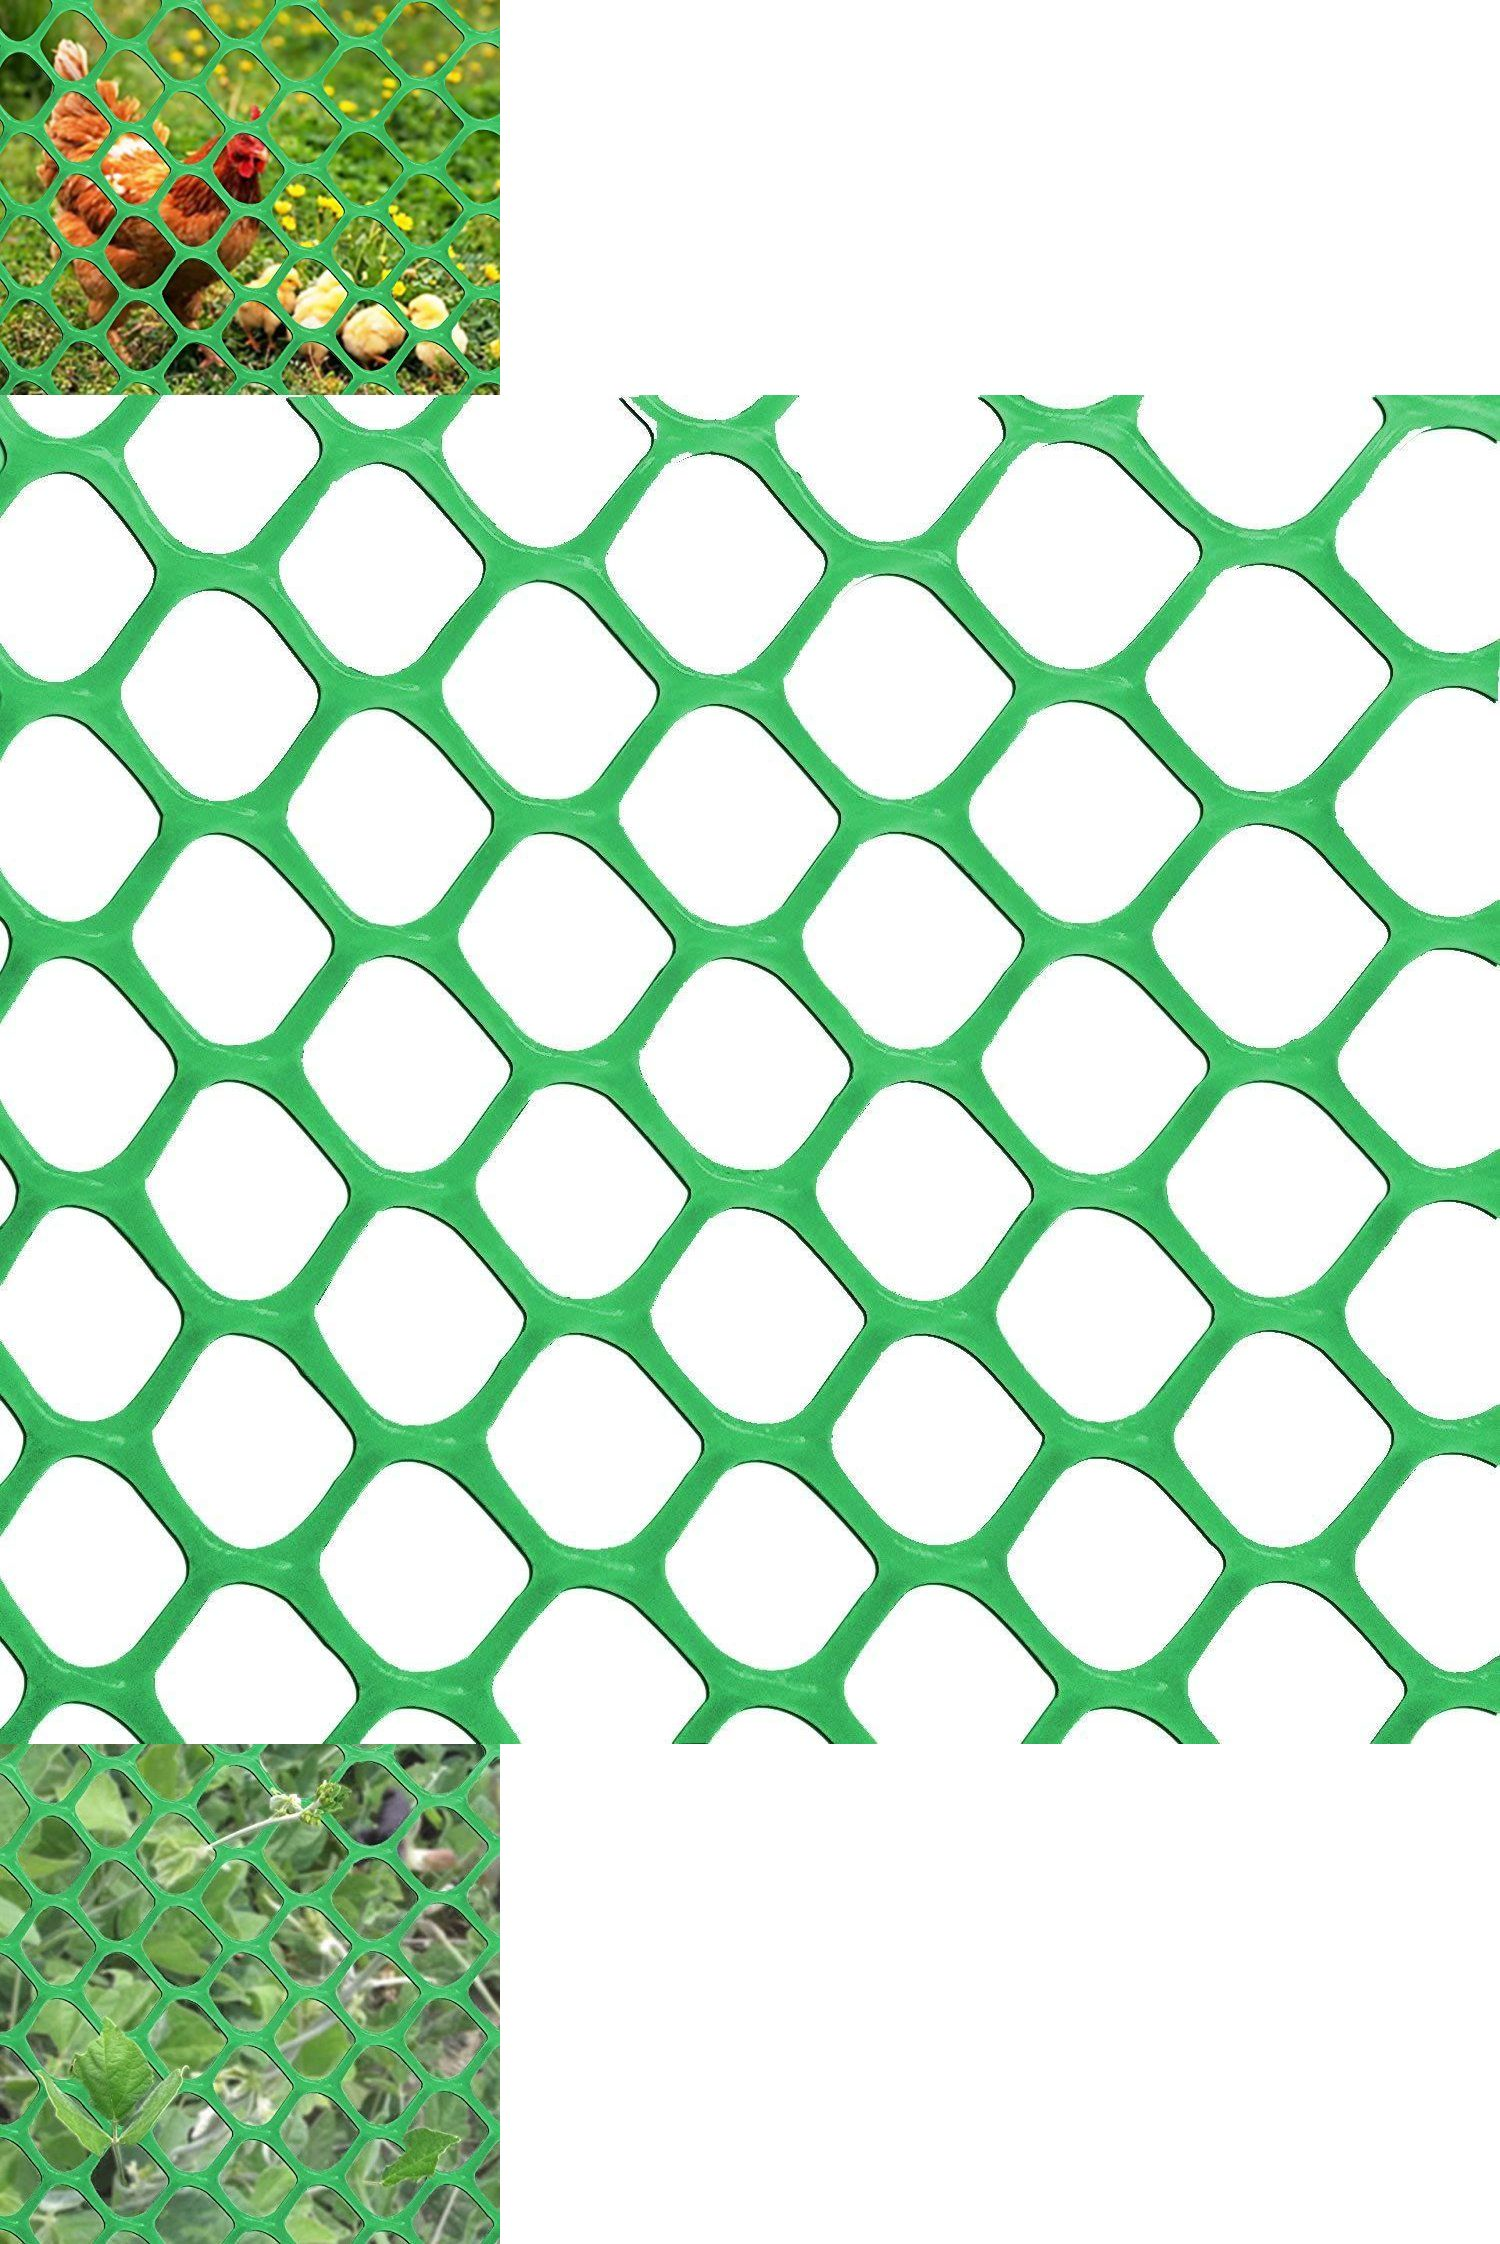 Details About V Protek Plastic Poultry Fence Poultry Netting